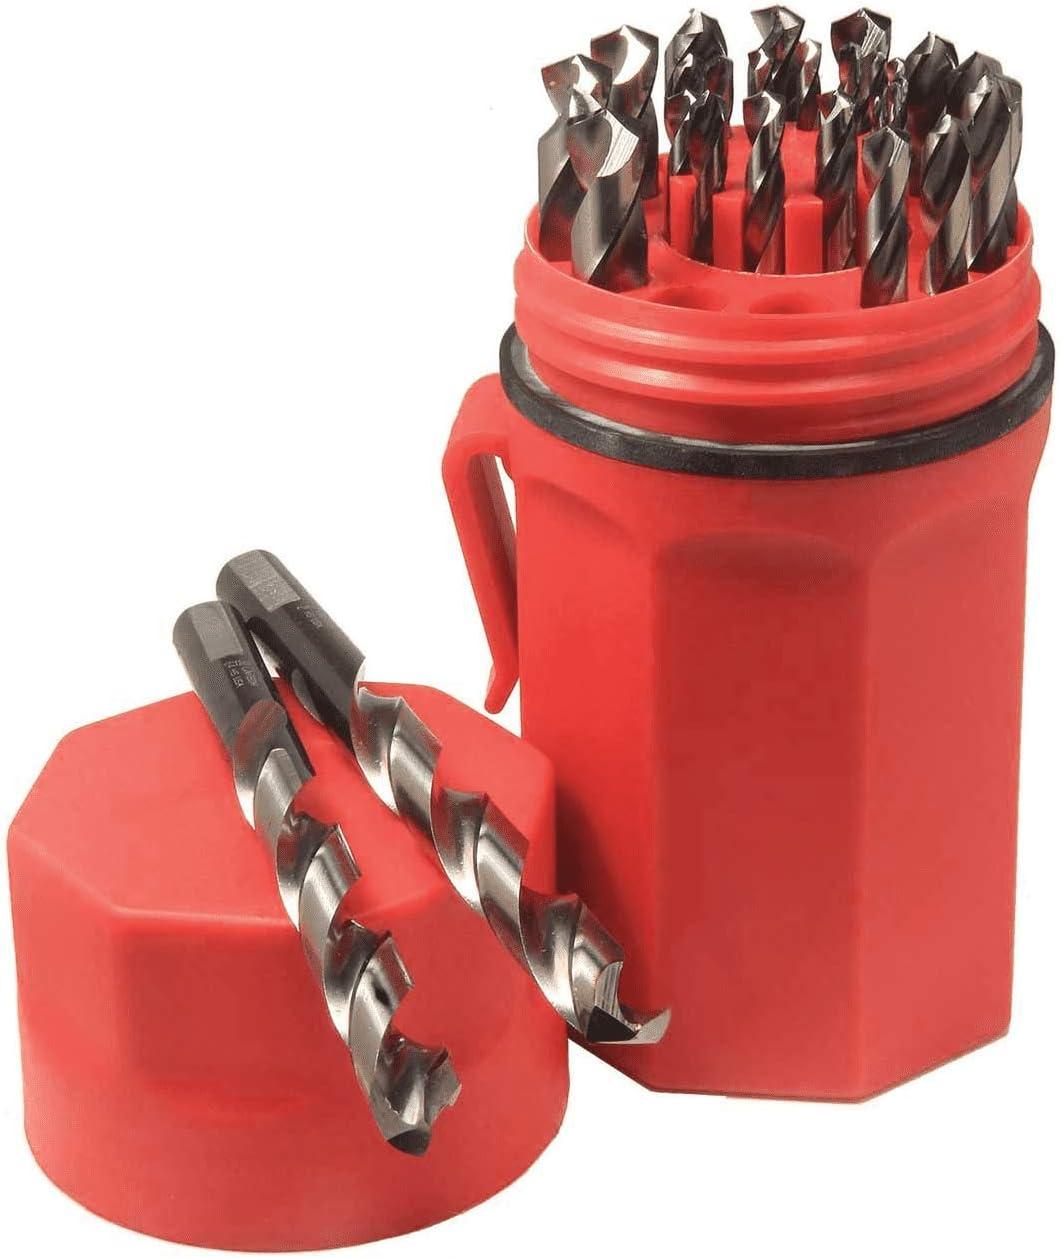 Norseman CN-TECH Cryogenic Nitrided Super Premium 29 Piece Drill Bit Set Round Shank with Three Flats Red Ultradex 47462-135 Degree Split Point